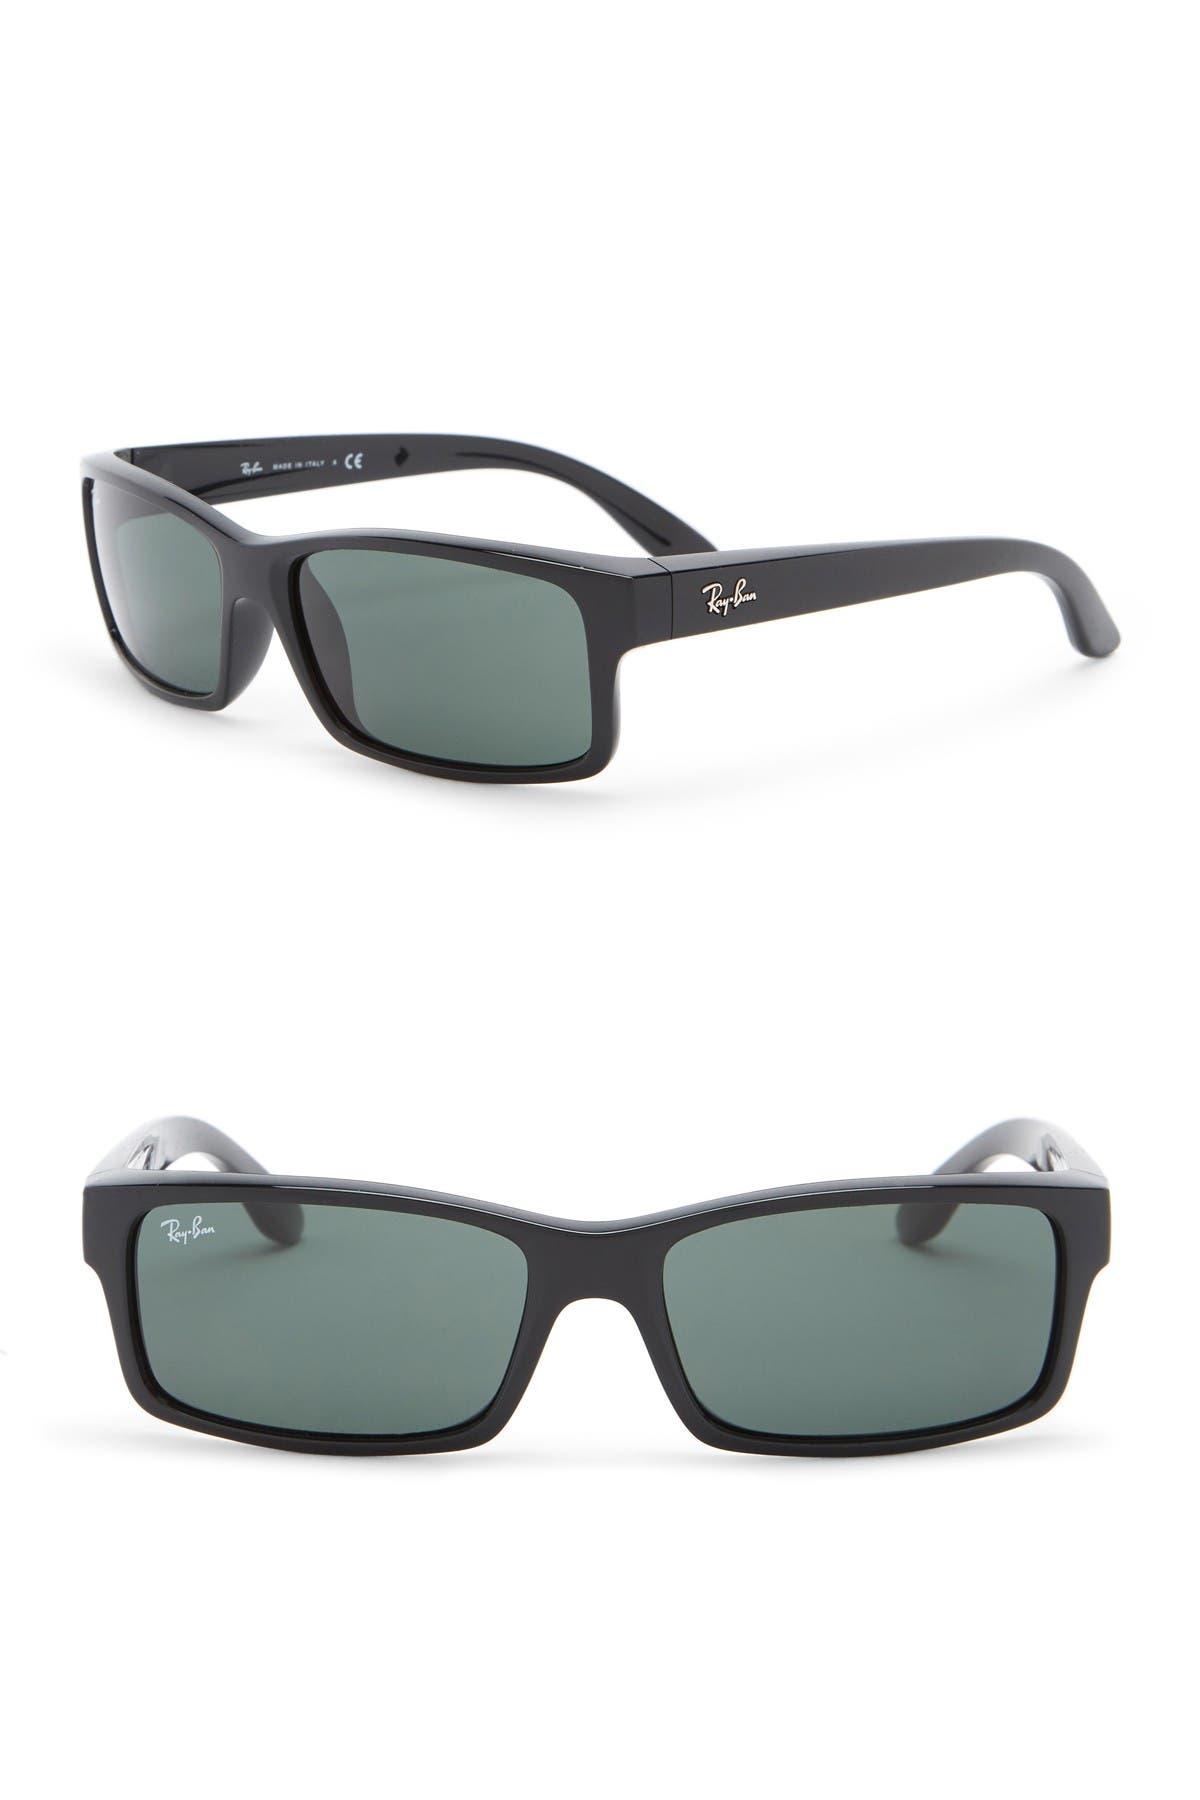 Image of Ray-Ban 59mm Polarized Rectangle Sunglasses